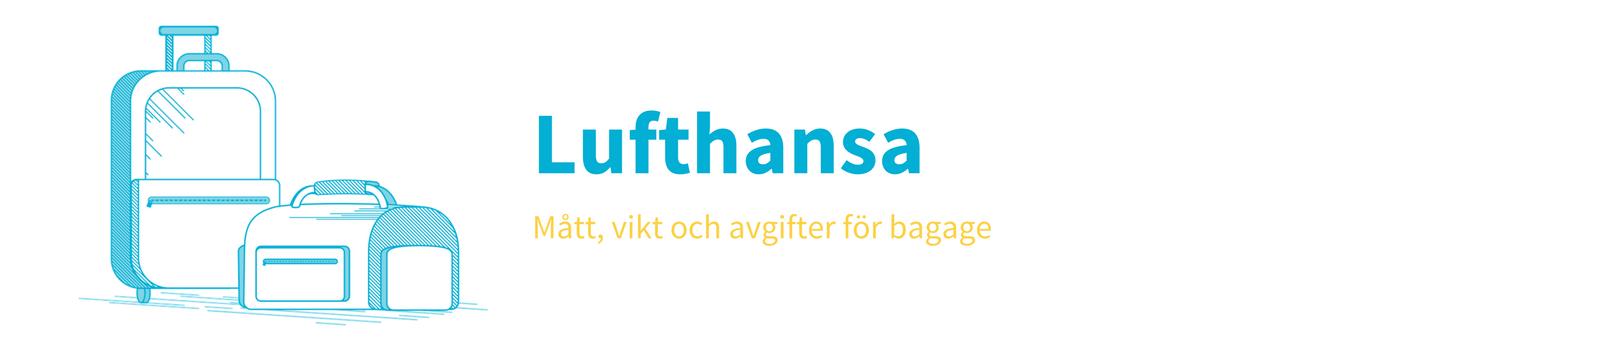 bagage storlek norwegian